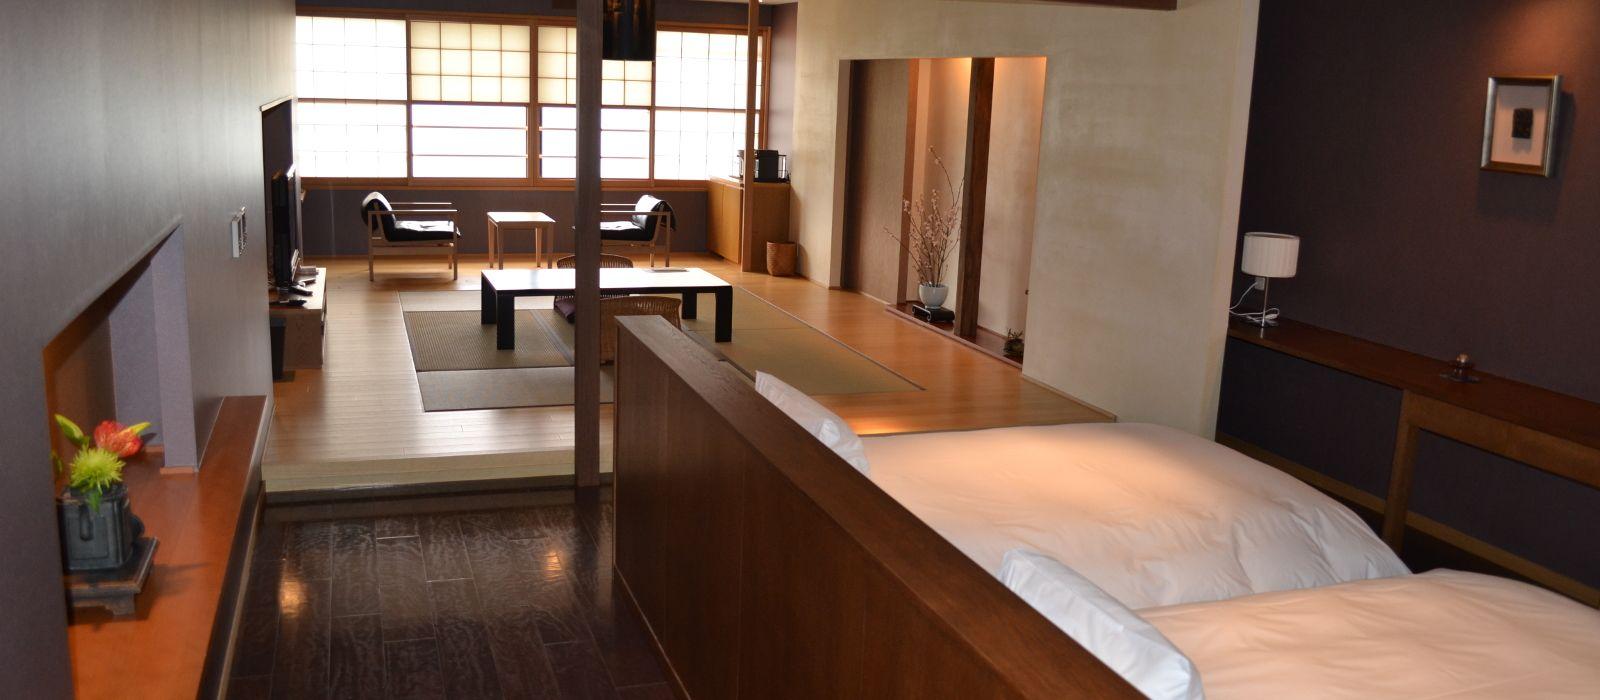 Hotel Iroha Ryokan Miyajima Japan